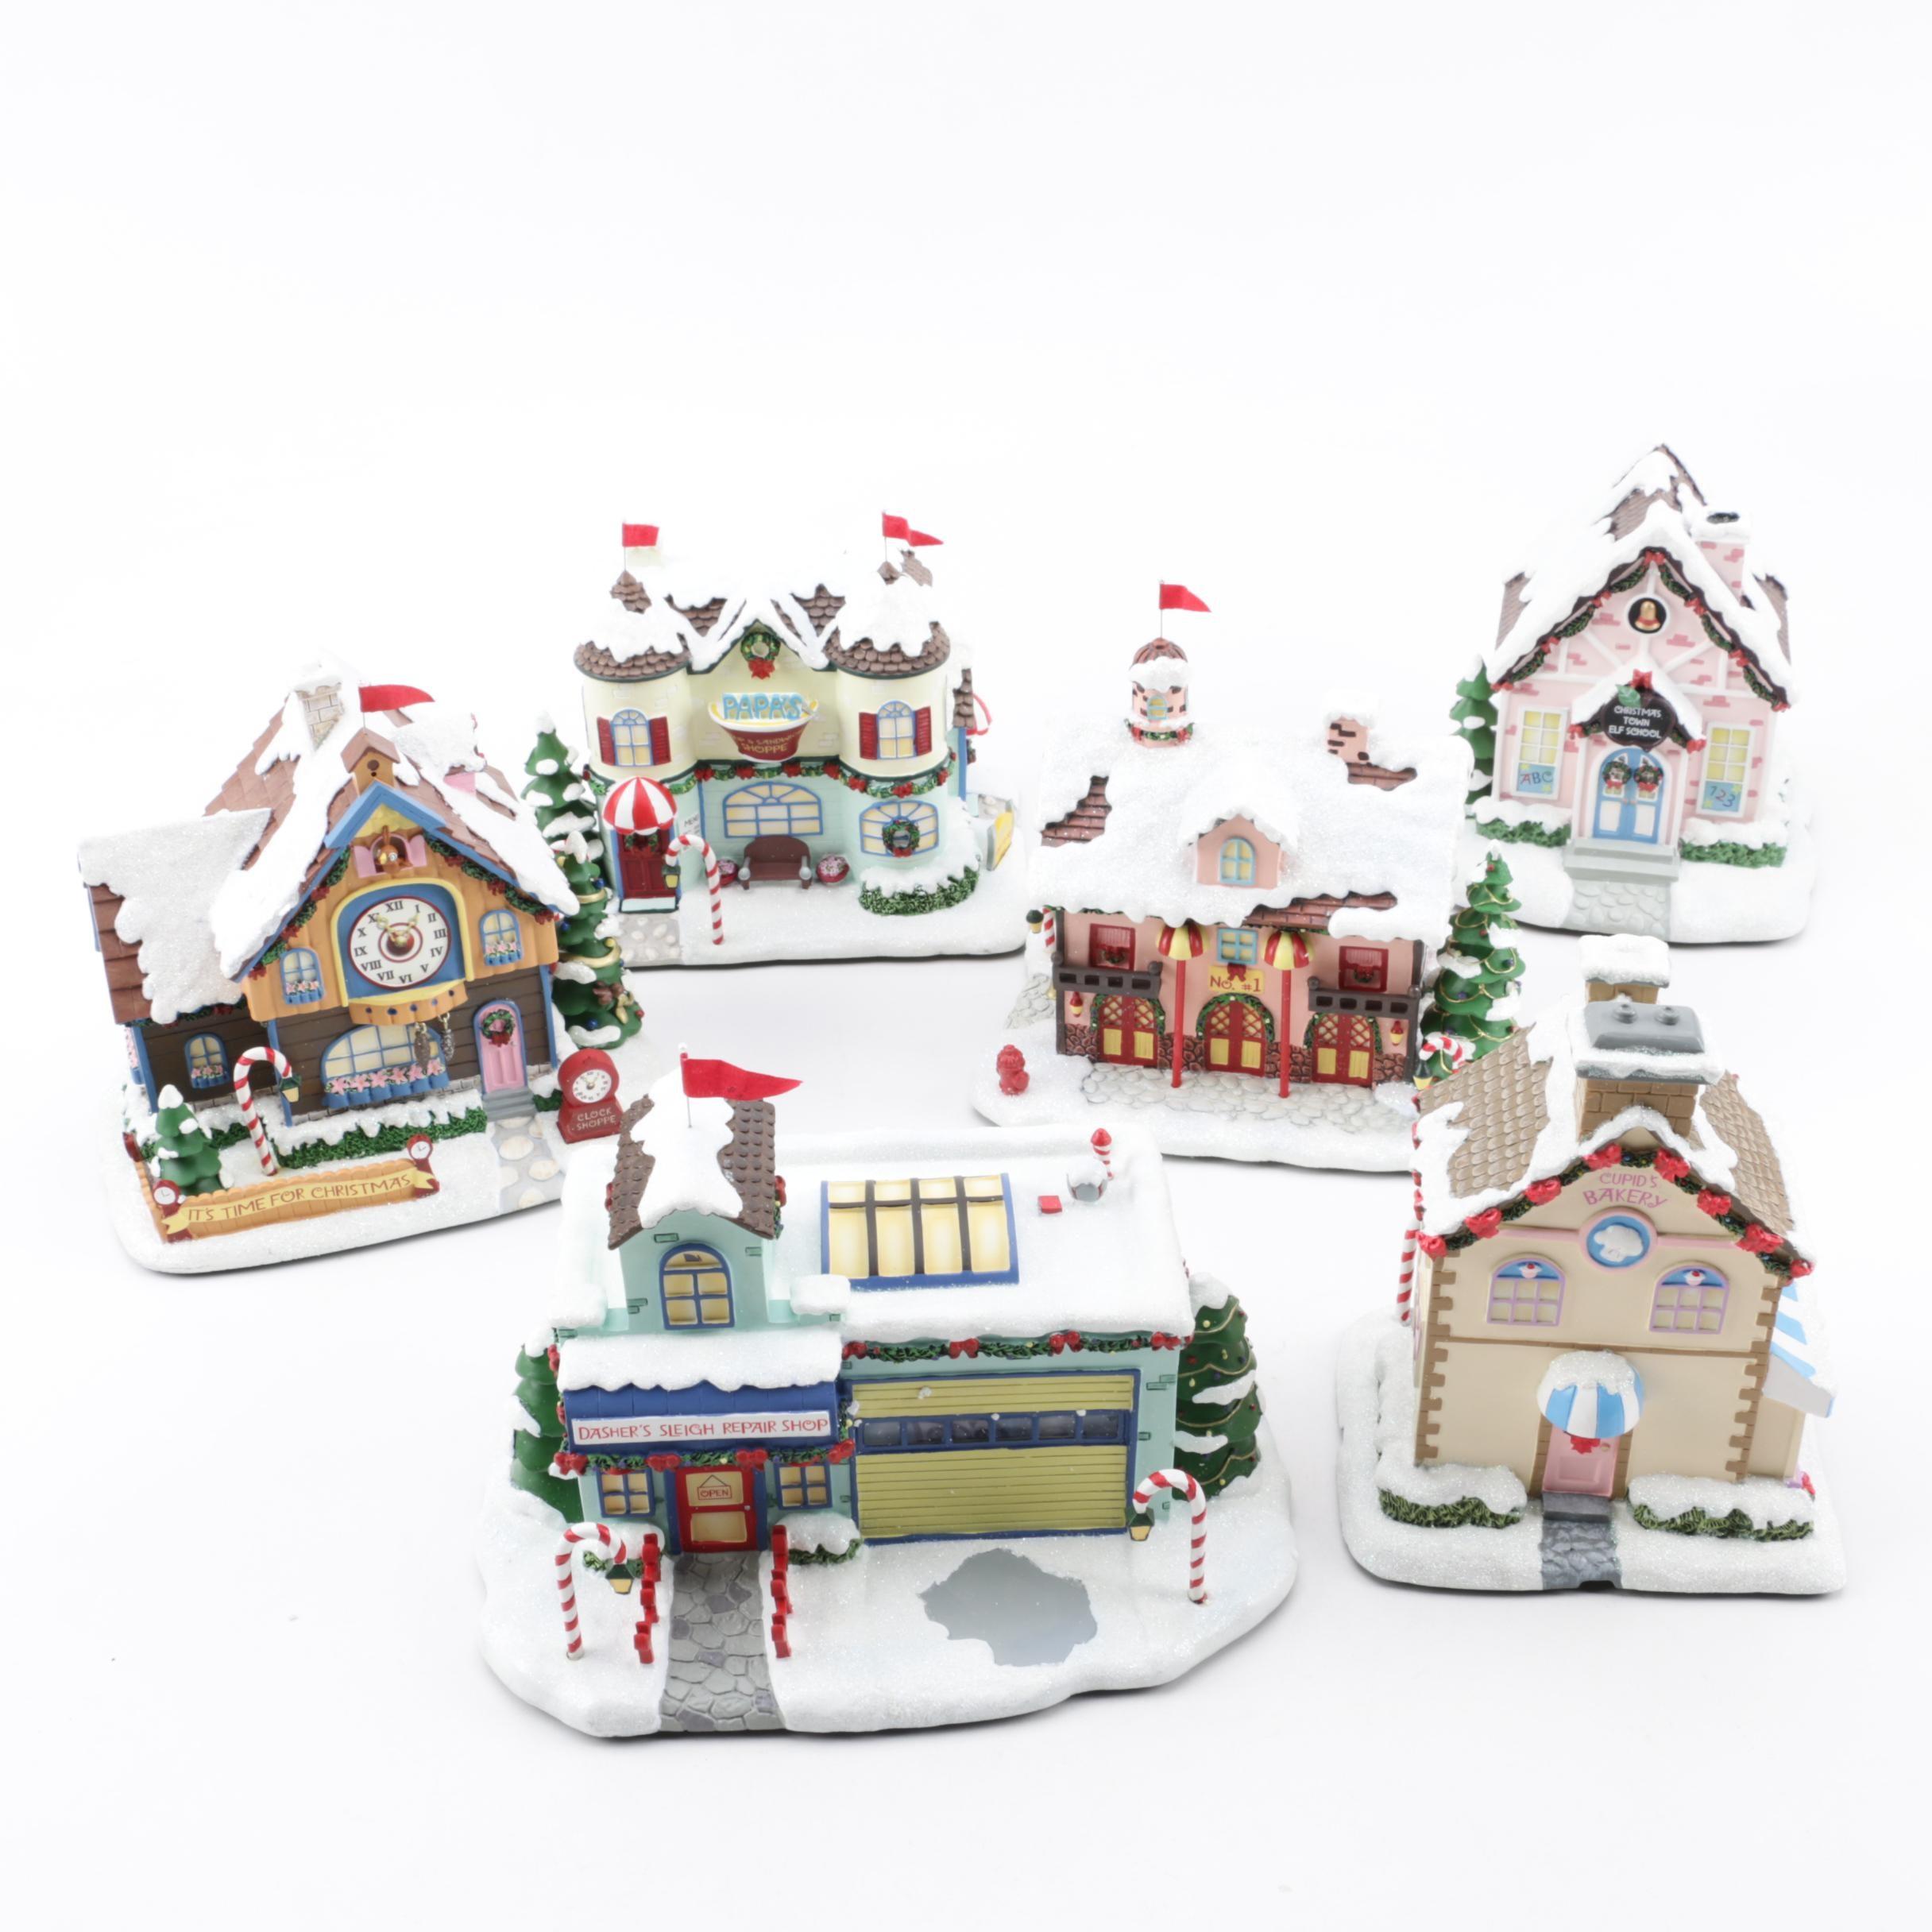 Hawthorne Village Light-Up Christmas Village Structures